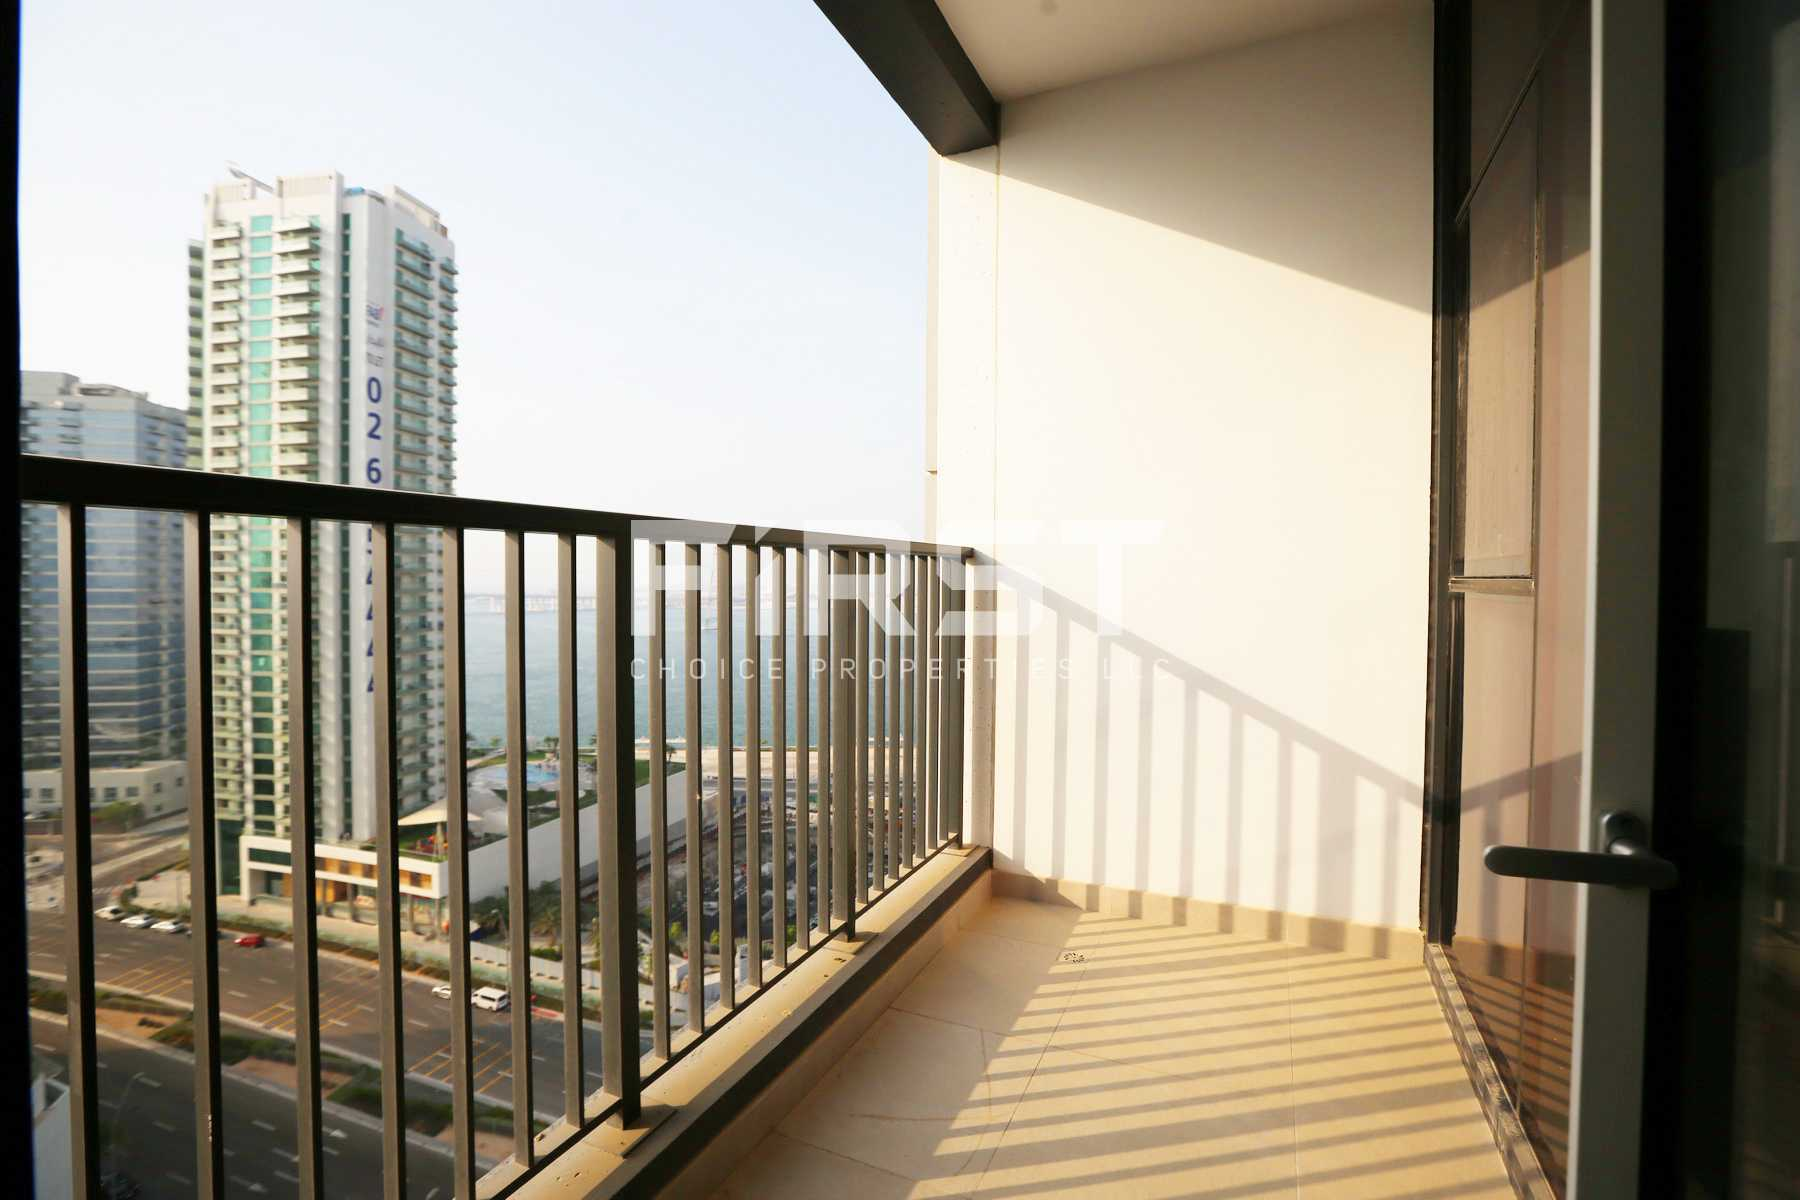 Internal Photo of 1 Bedroom Apartment in The Bridges Shams Abu Dhabi UAE (1).jpg